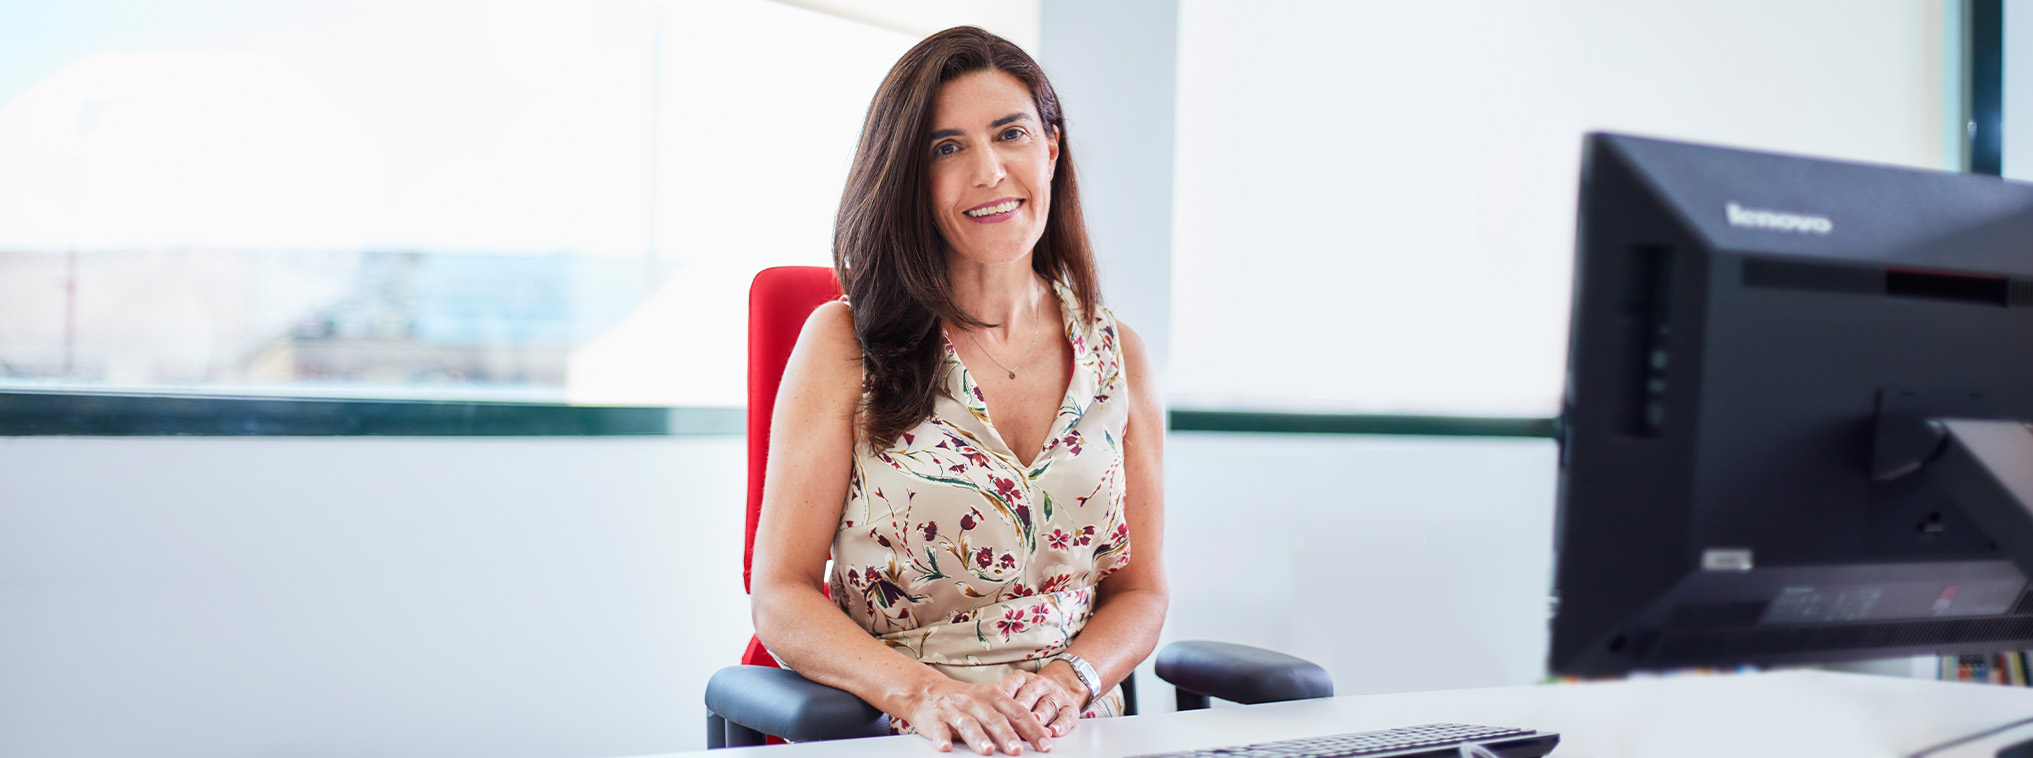 maria luisa romero - palibex - especial paletería logistica profesional